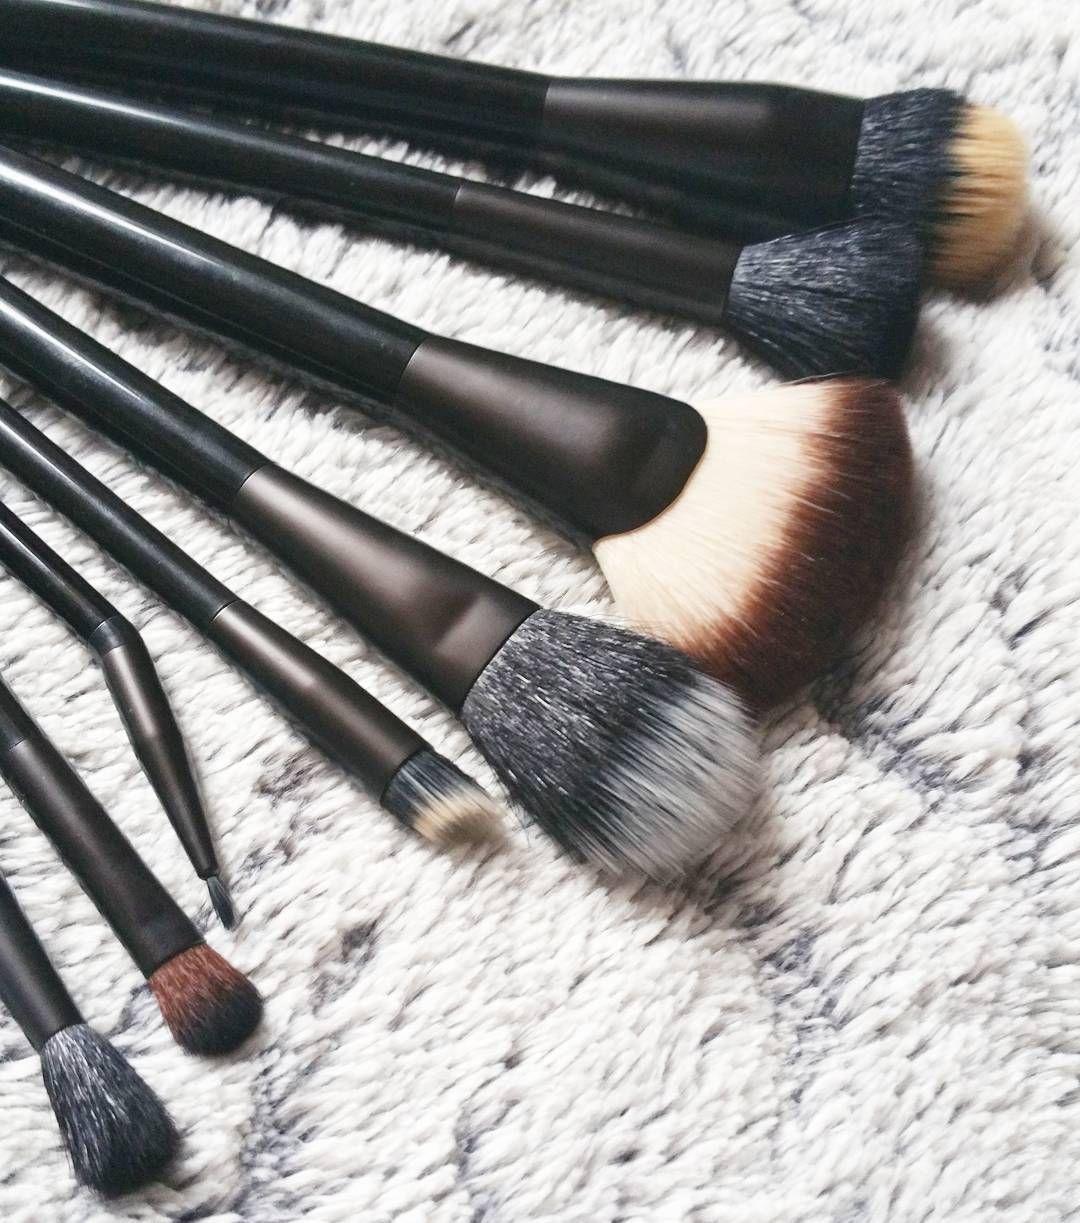 NYX Cosmetics Pro Contour Brush Review Allure Makeup